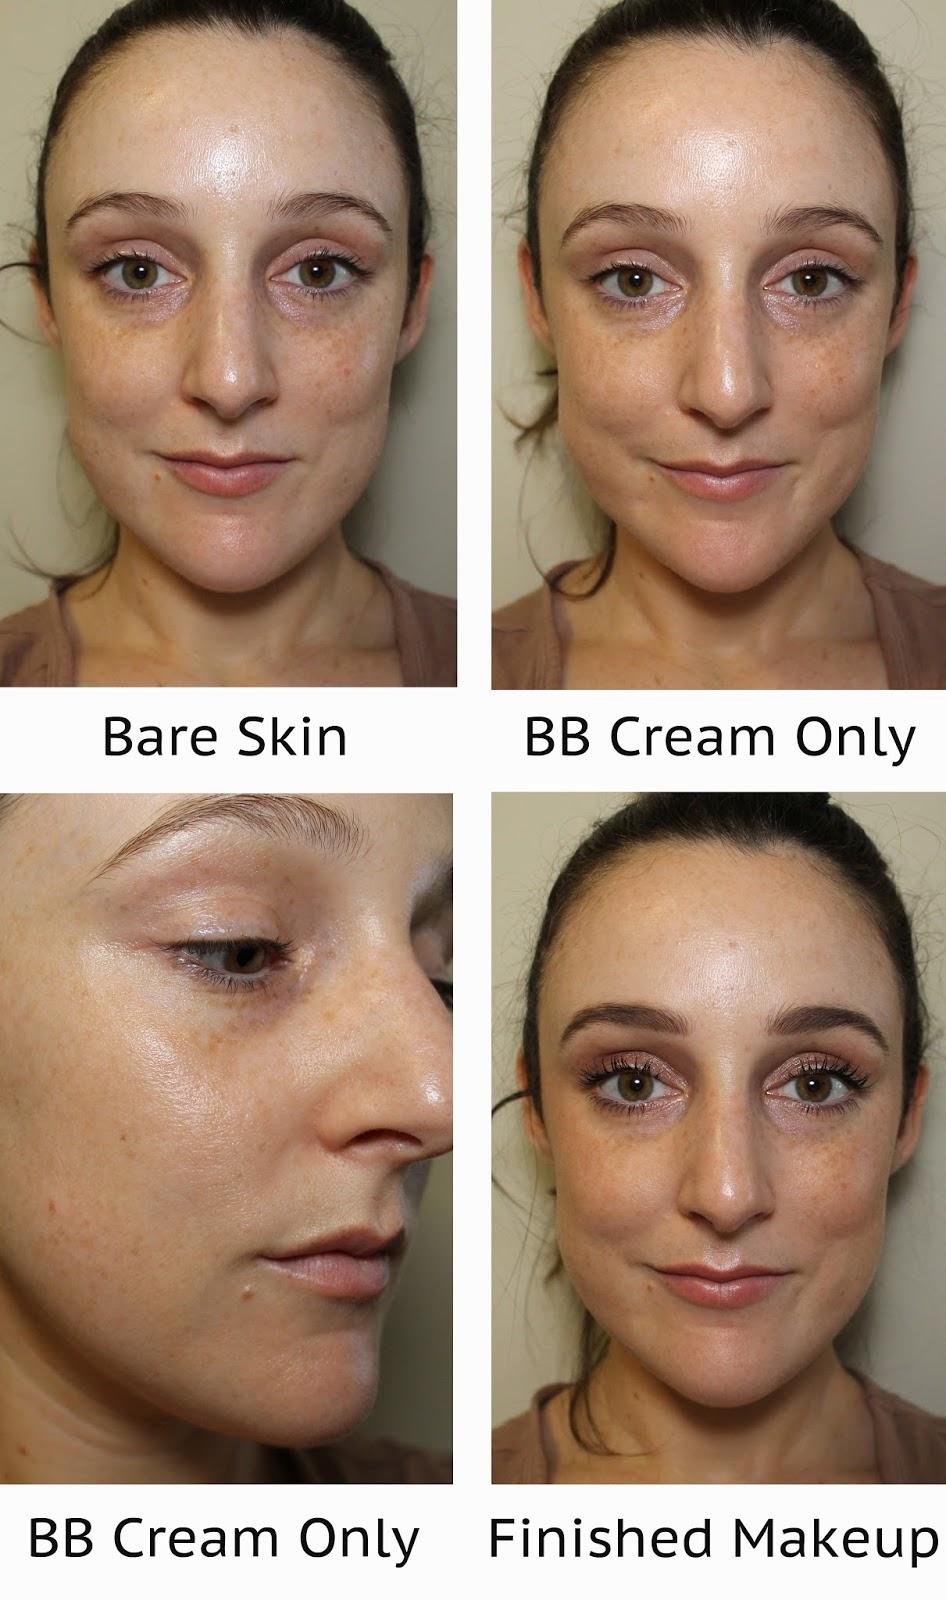 bb cream coverage